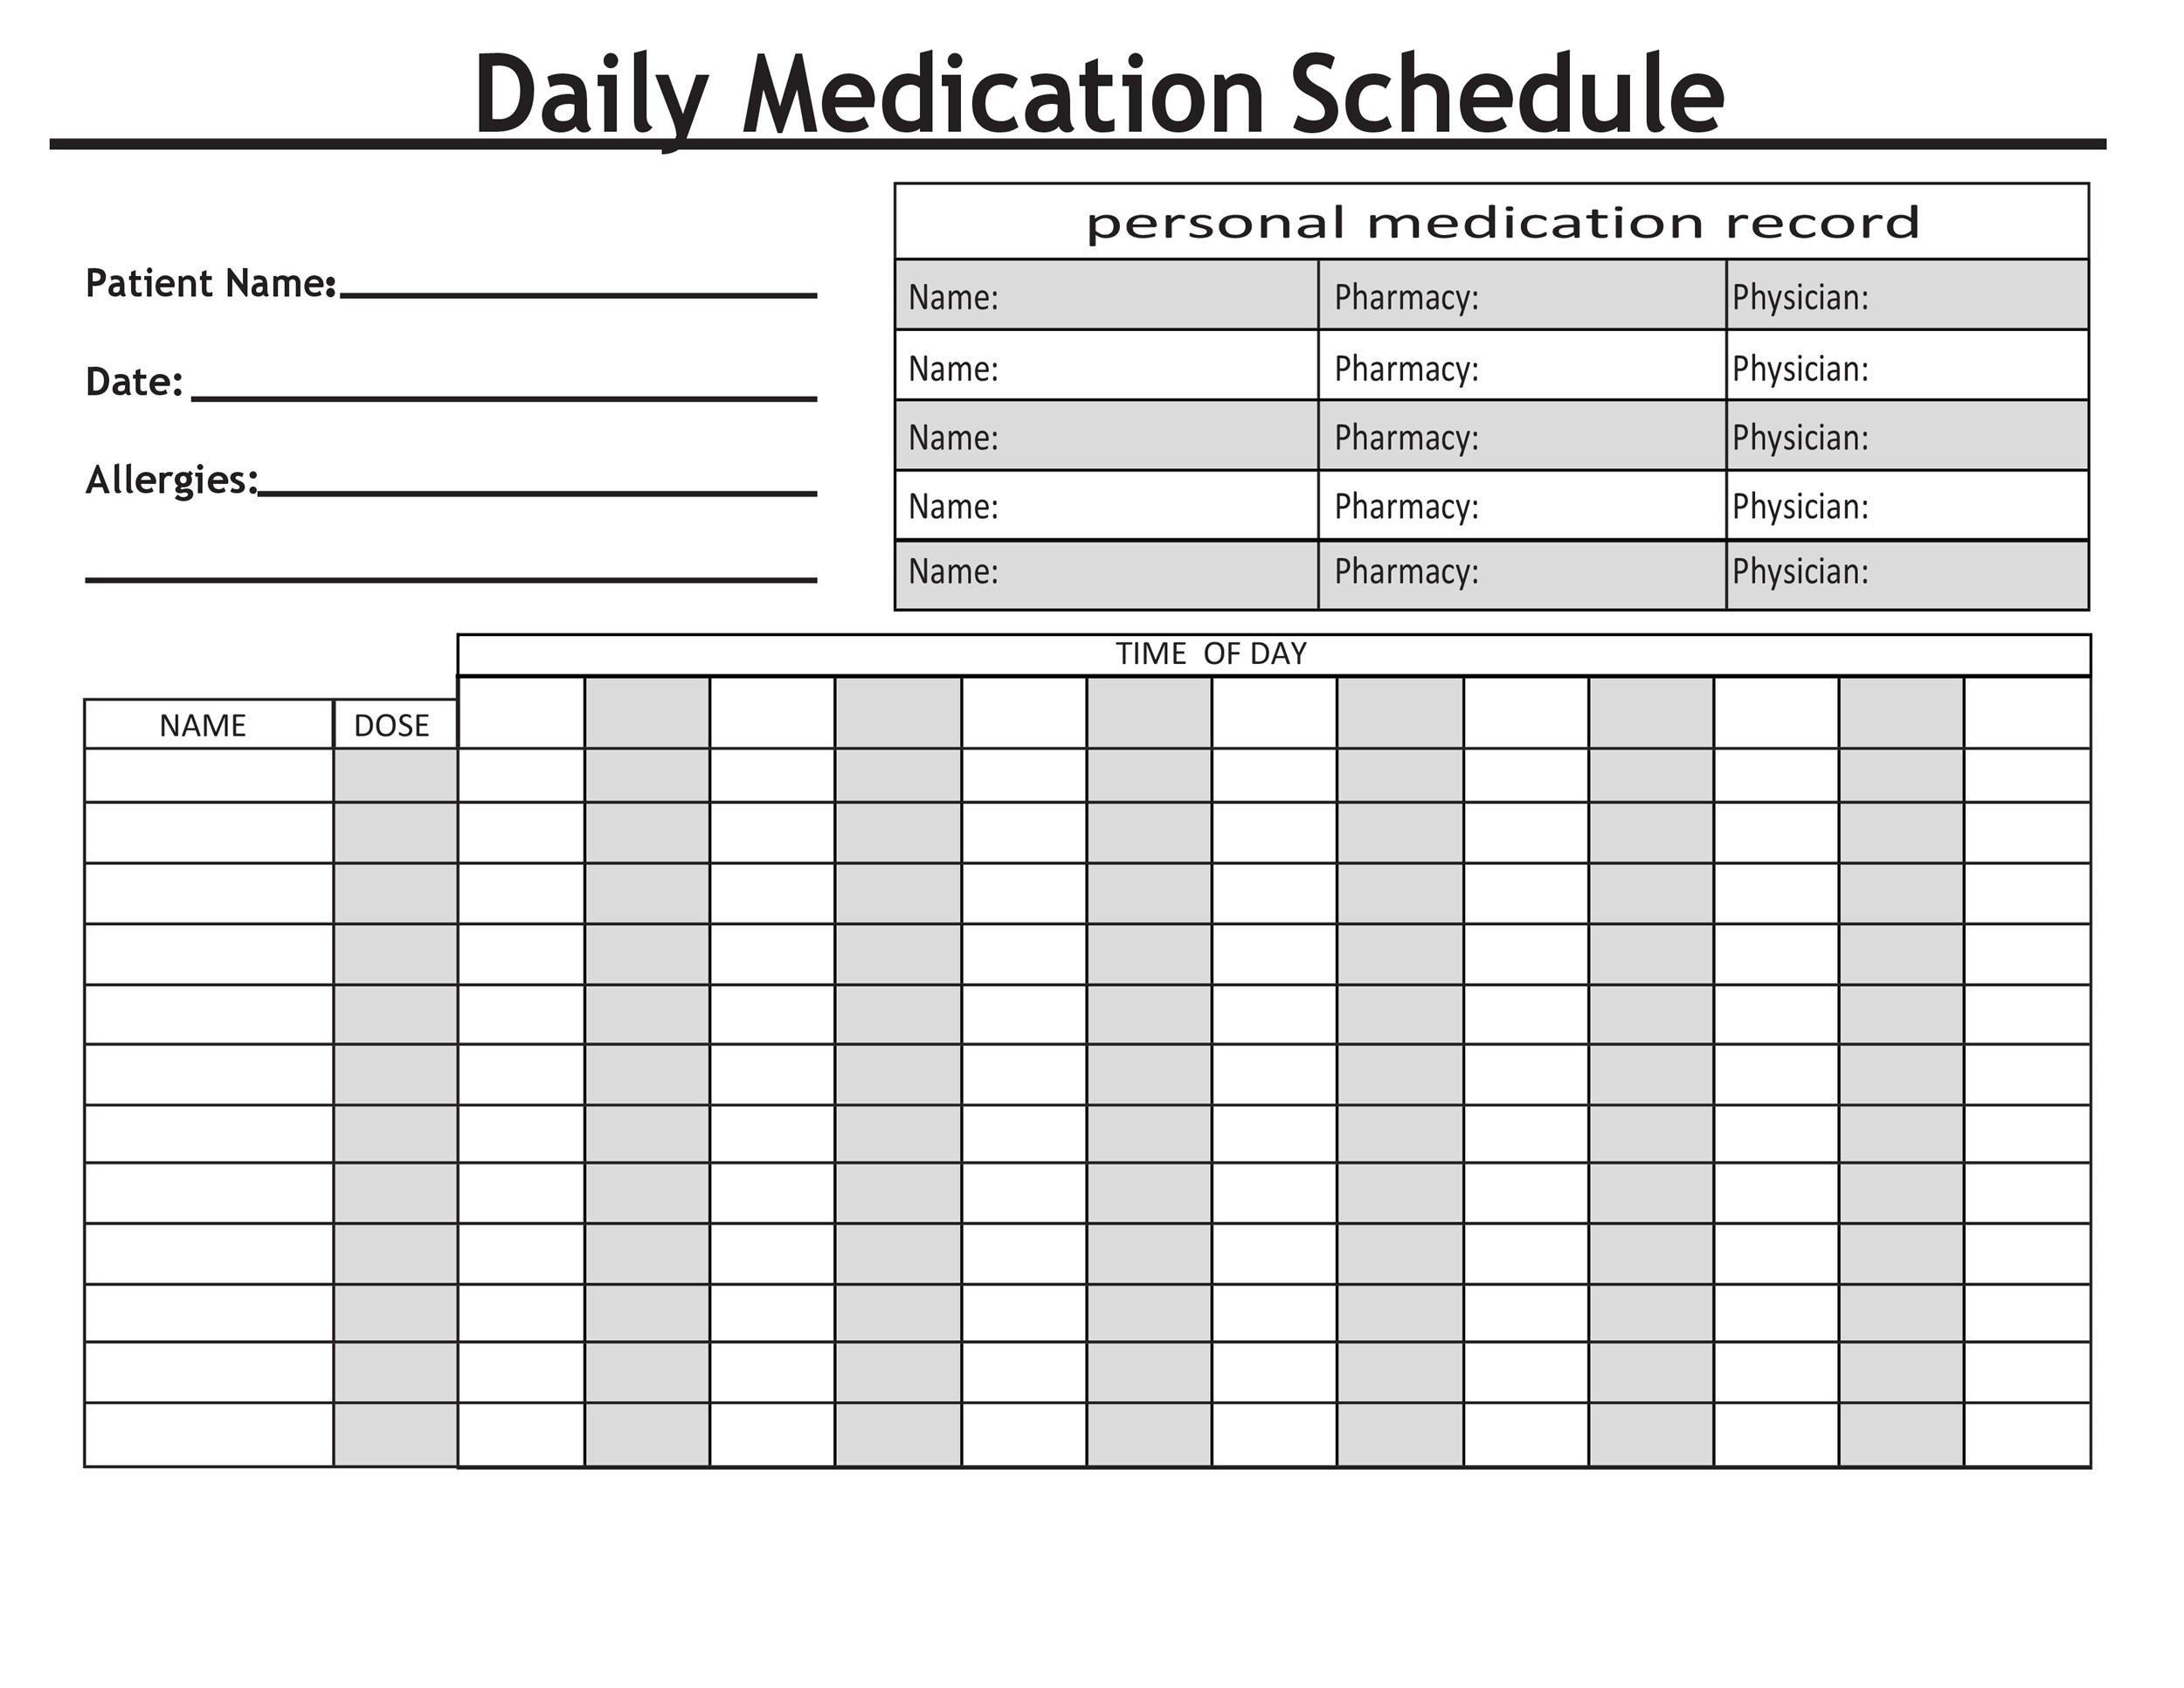 40 Great Medication Schedule Templates (+Medication Calendars) Short Timer Calendar Download Free